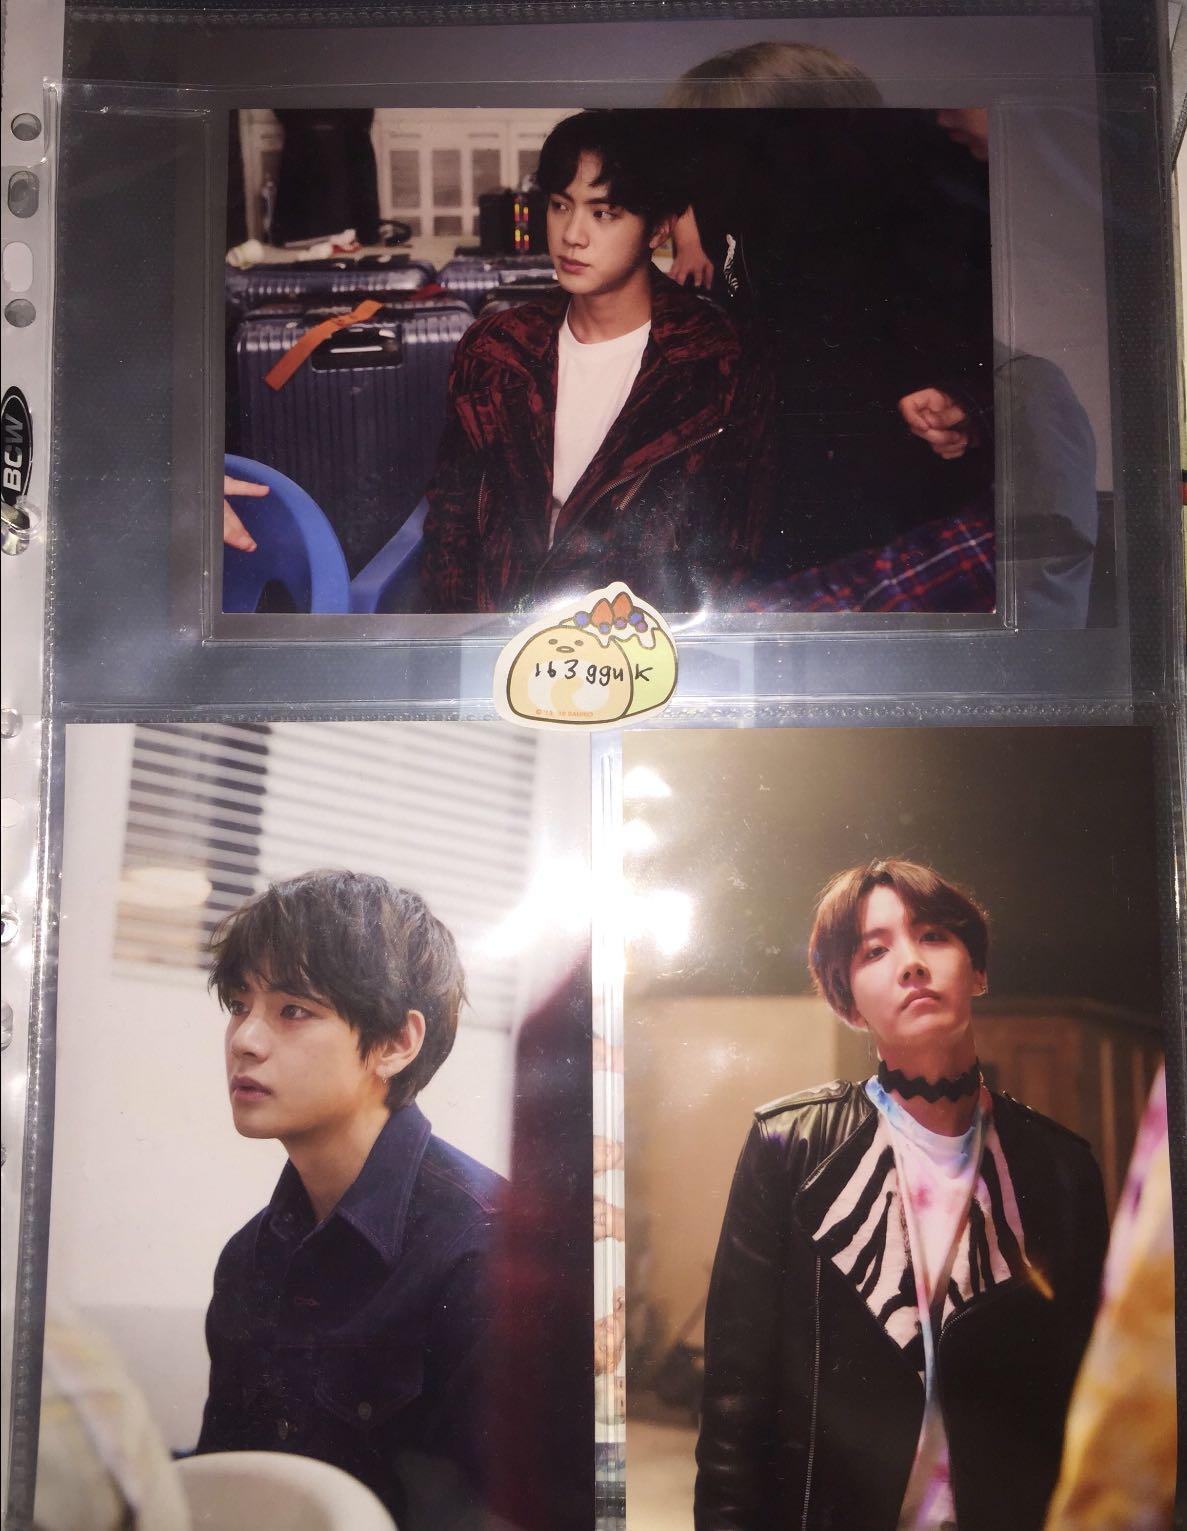 bts oneul exhibition live photo / pc / photocard taehyung hobi